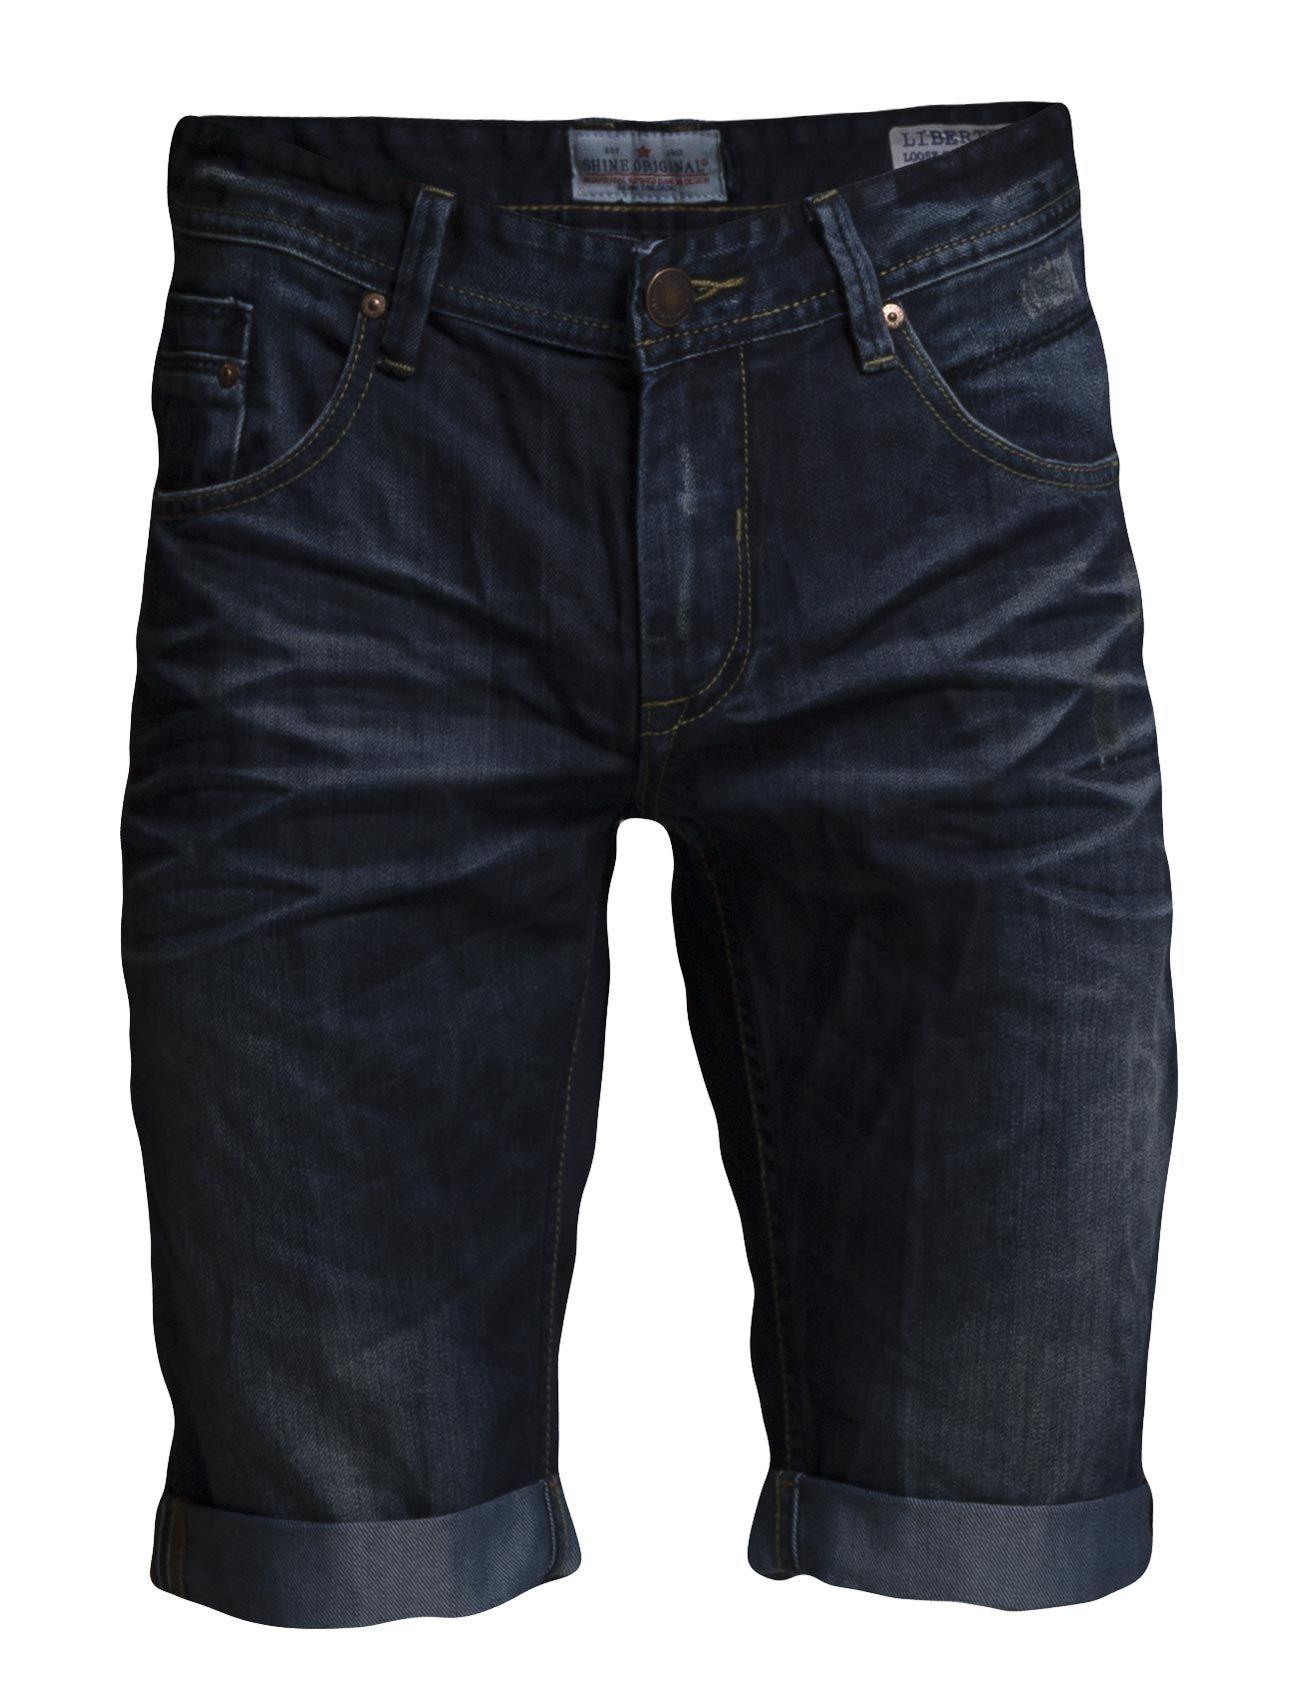 Denim Shorts – Juicy Blue